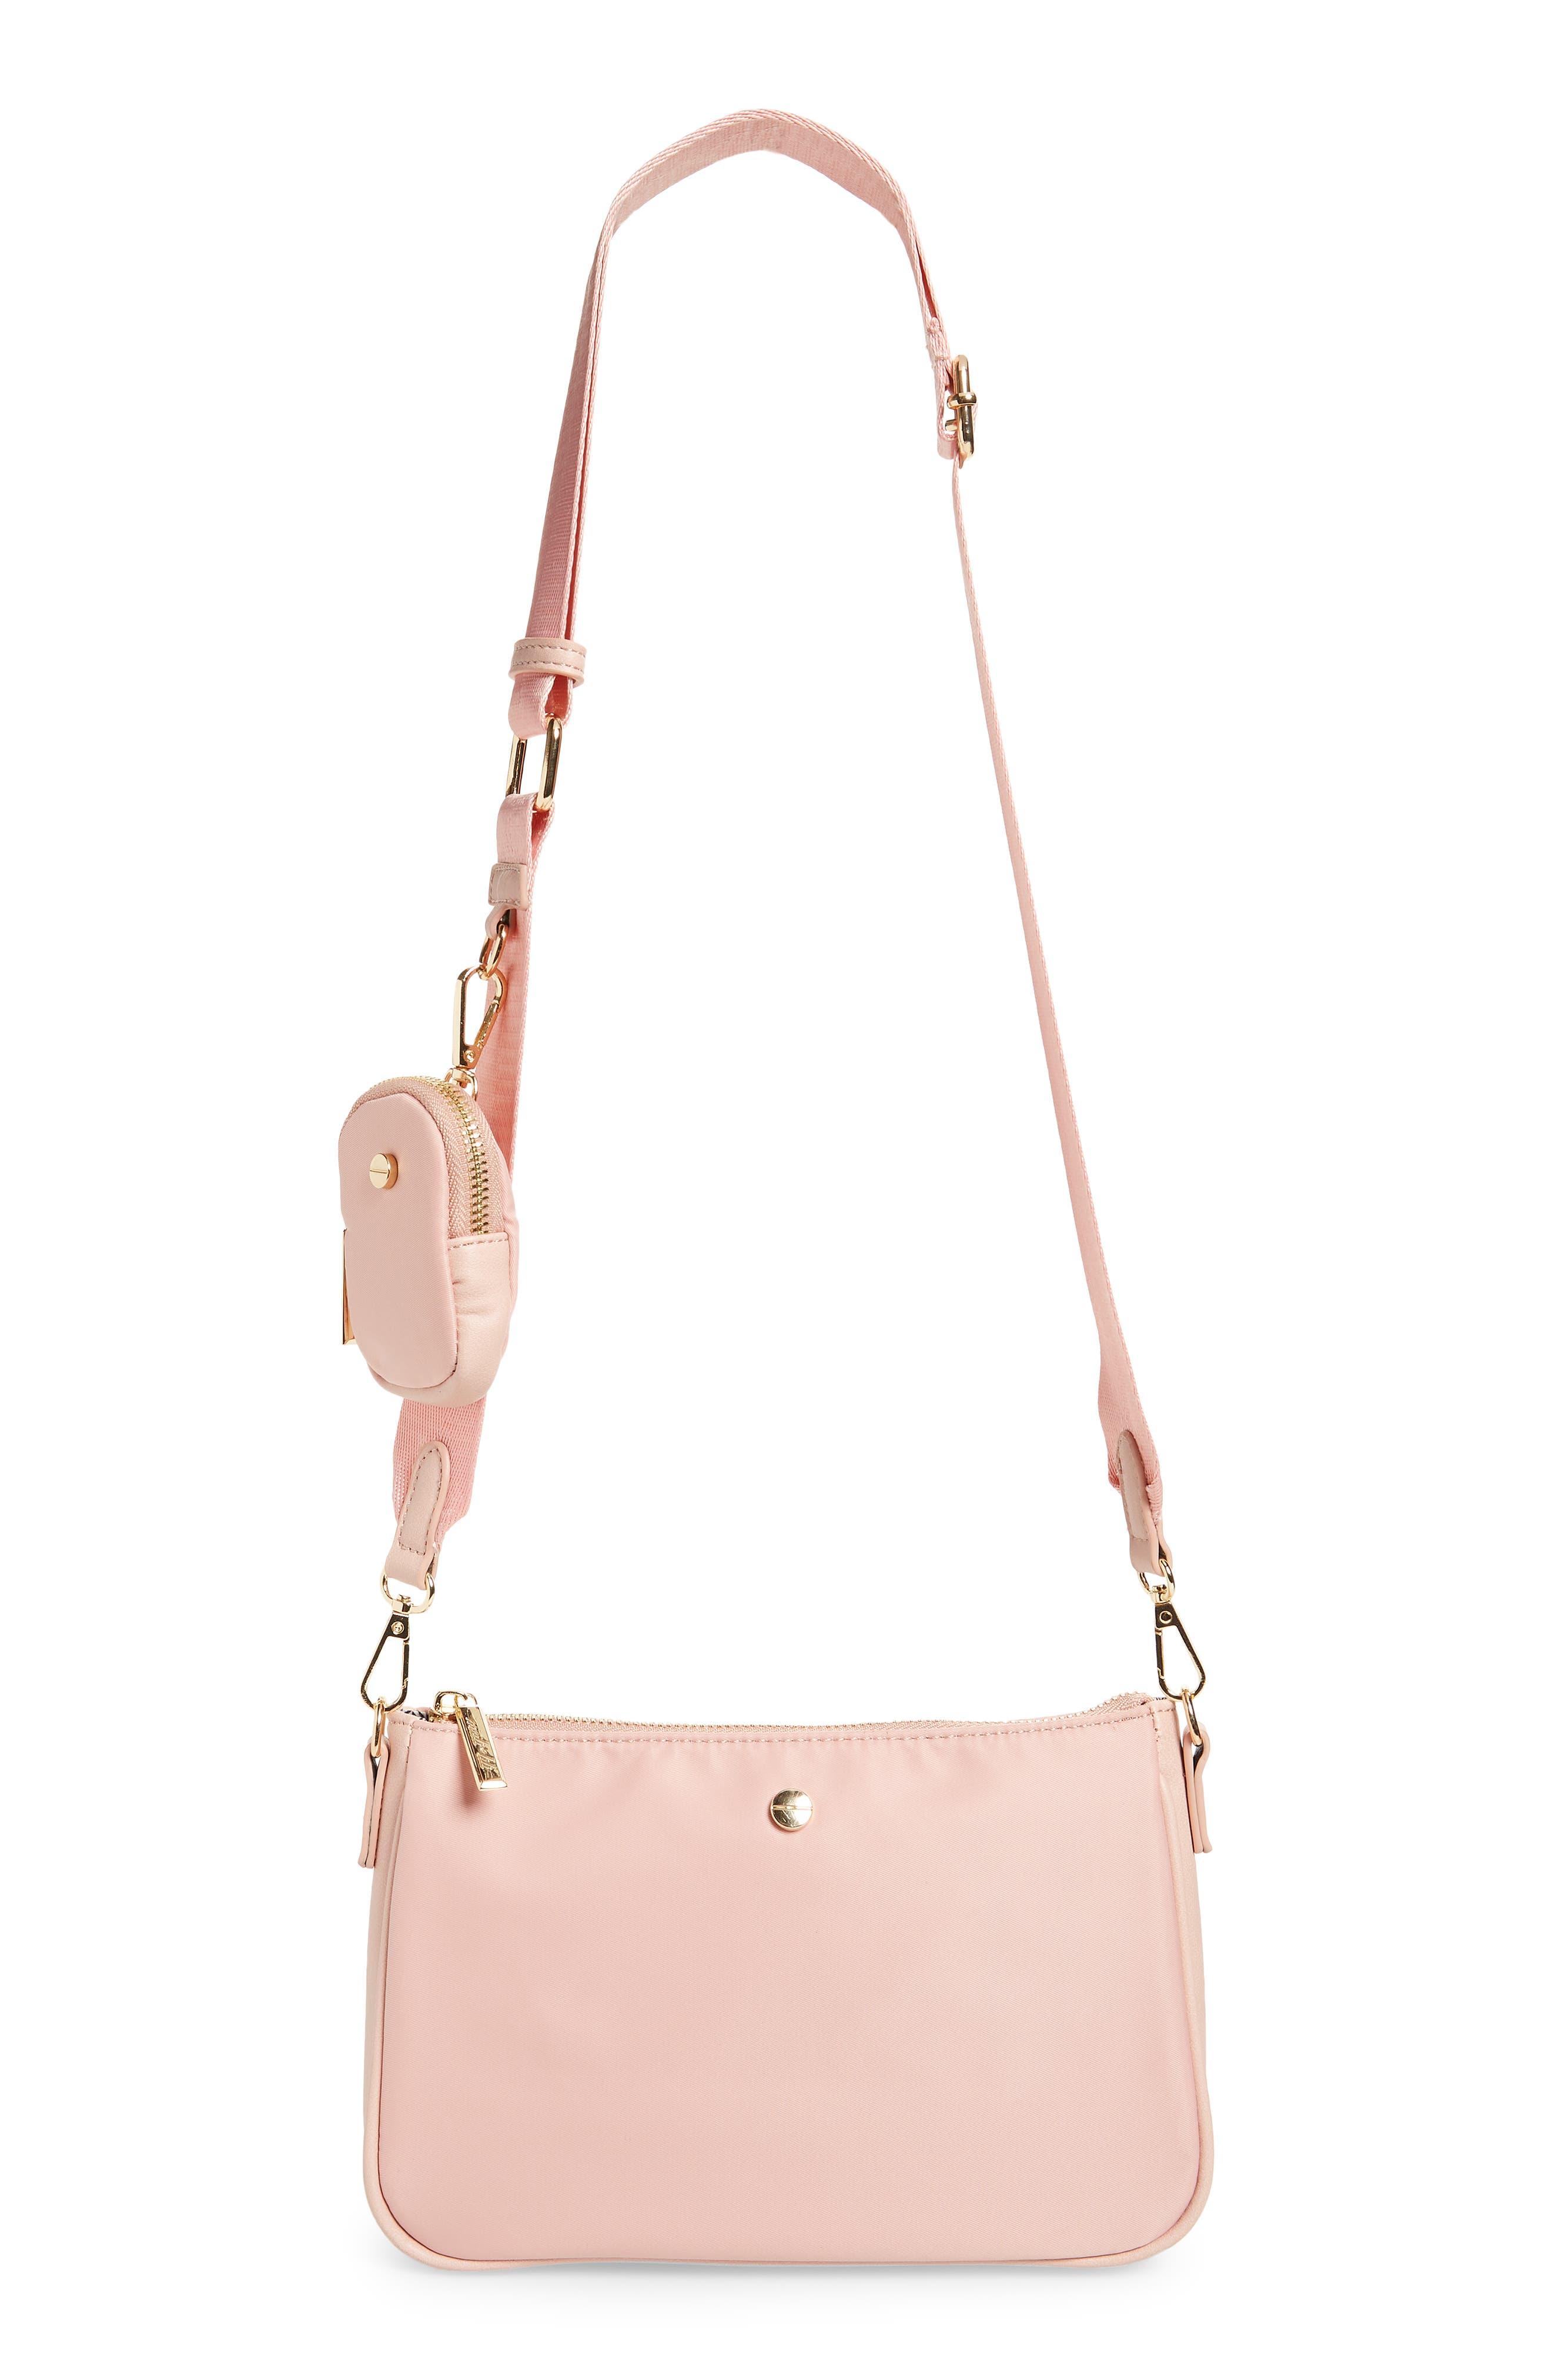 Mali + Lili Marlowe Nylon Crossbody Bag With Detachable Pouch